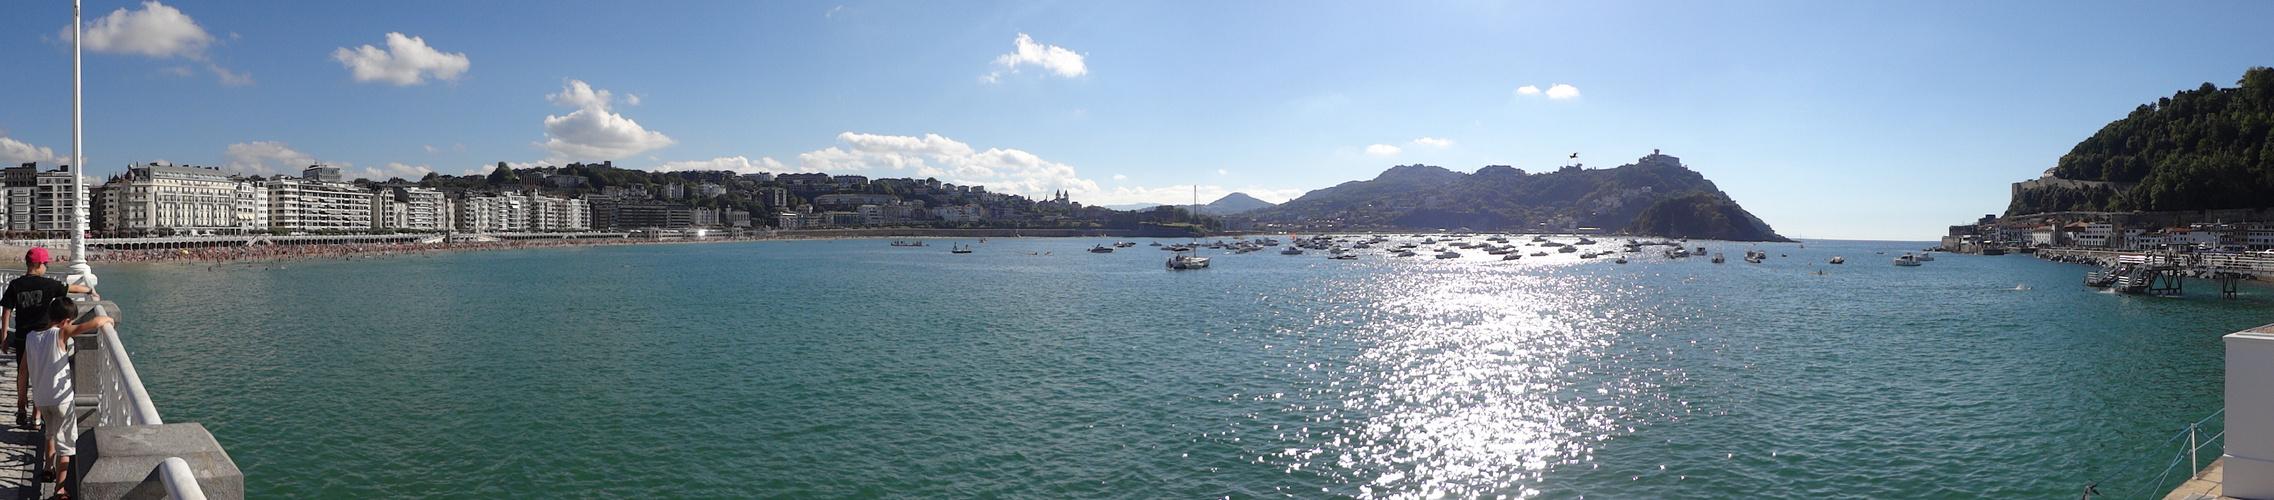 La baia di San Sebastian-Donostia, Spagna, paesi baschi